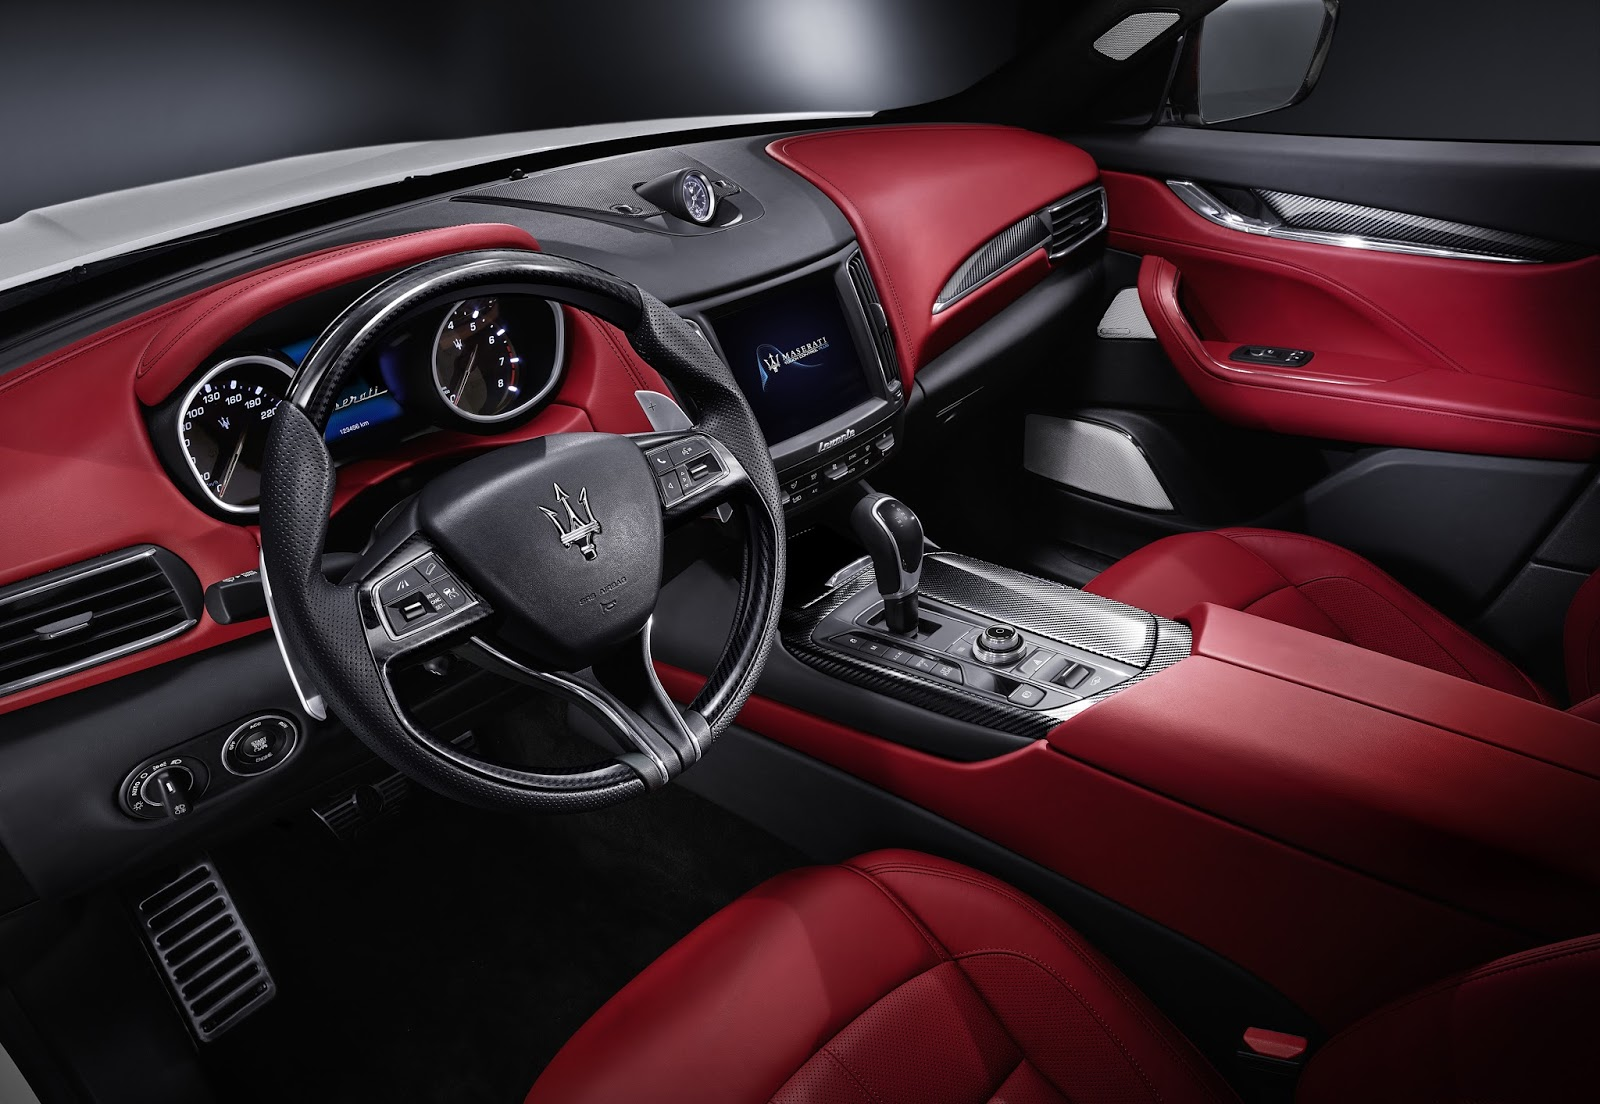 56d55f7e7f556 Τα πάντα για το πρώτο SUV της Maserati autoshow, Maserati, Maserati Ghibli, Maserati Ghibli S, Maserati Ghibli S Q4, Maserati GranTurismo, Maserati Levante, Maserati Levante S, Maserati Quattroporte, zblog